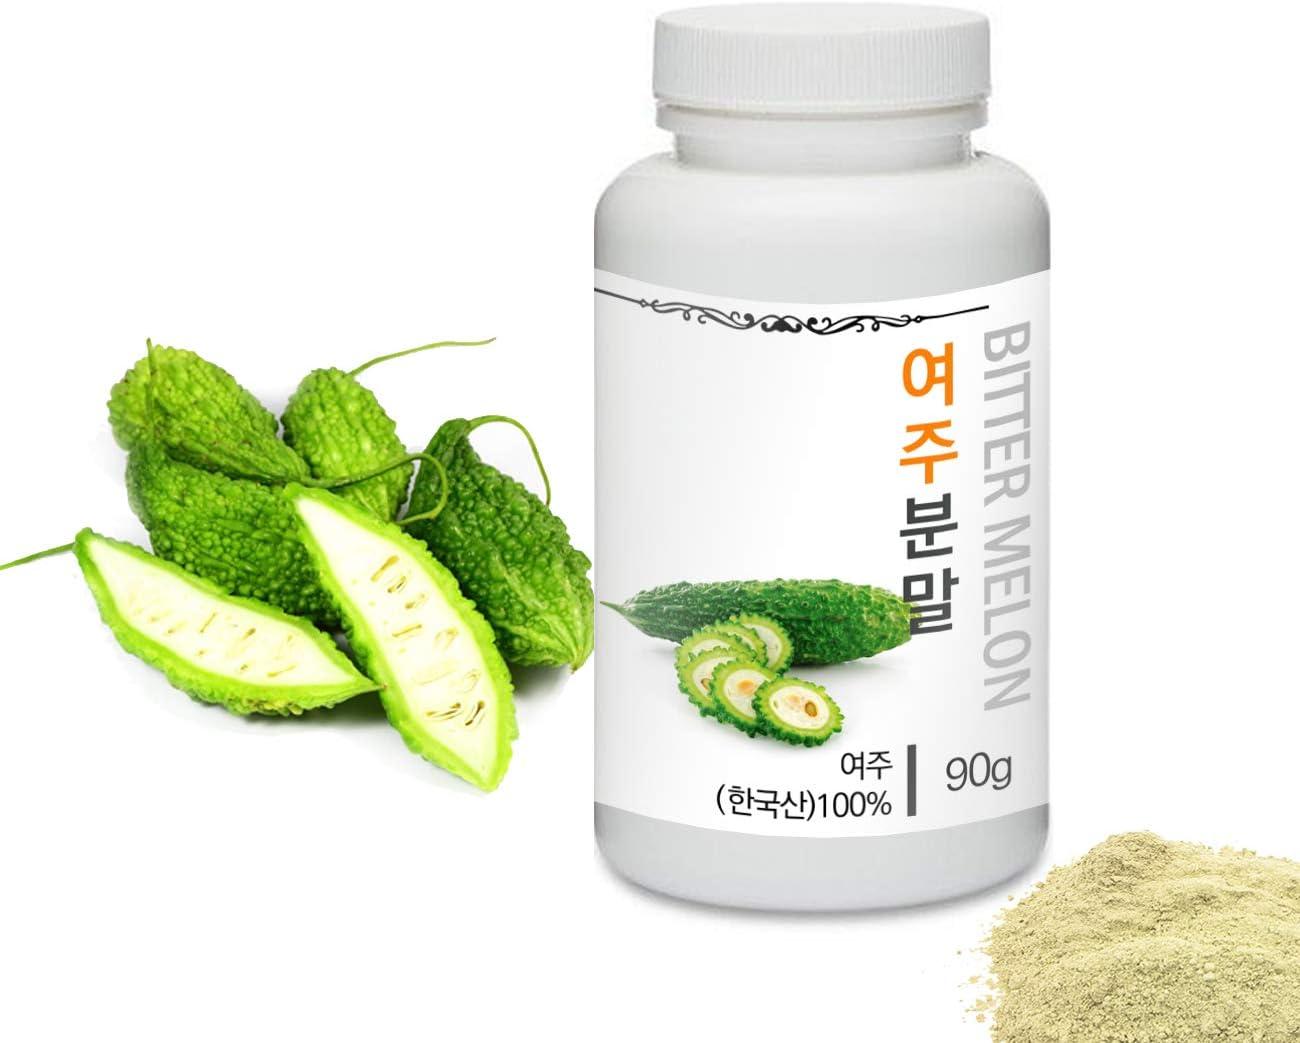 [Medicinal Herbal Powder] Prince Natural Bitter Melon Powder/프린스 여주분말, 3.2oz / 90g (Bitter Melon/여주)